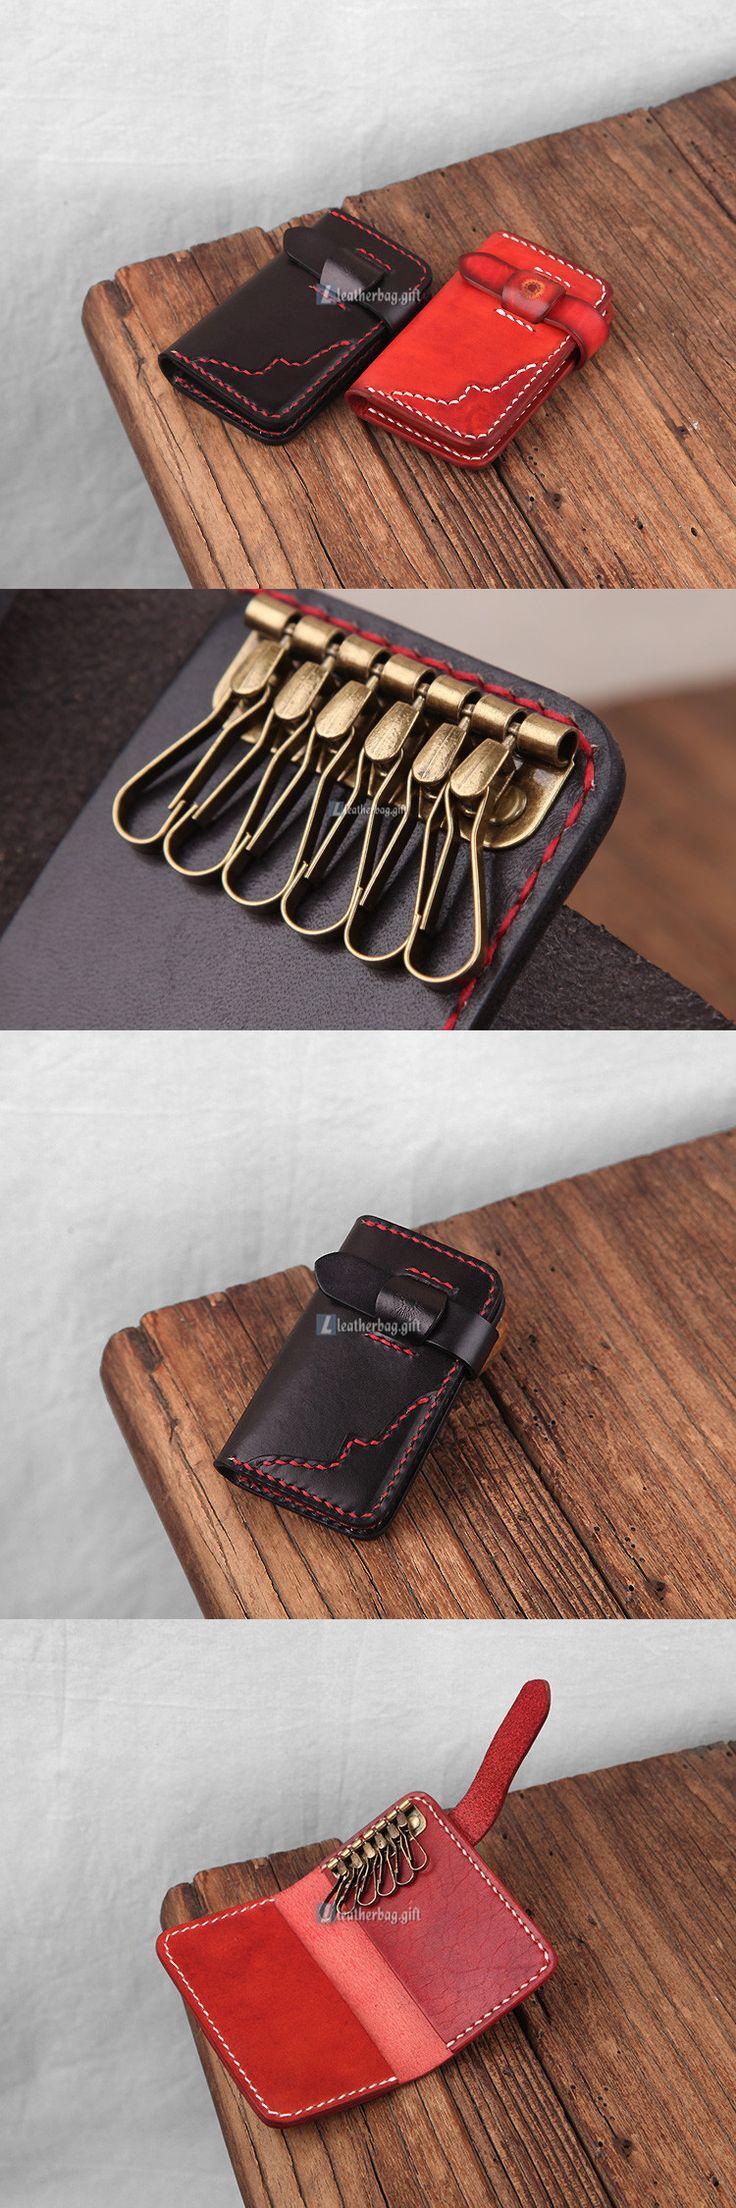 Leather Key Holder Key Wallet (3)